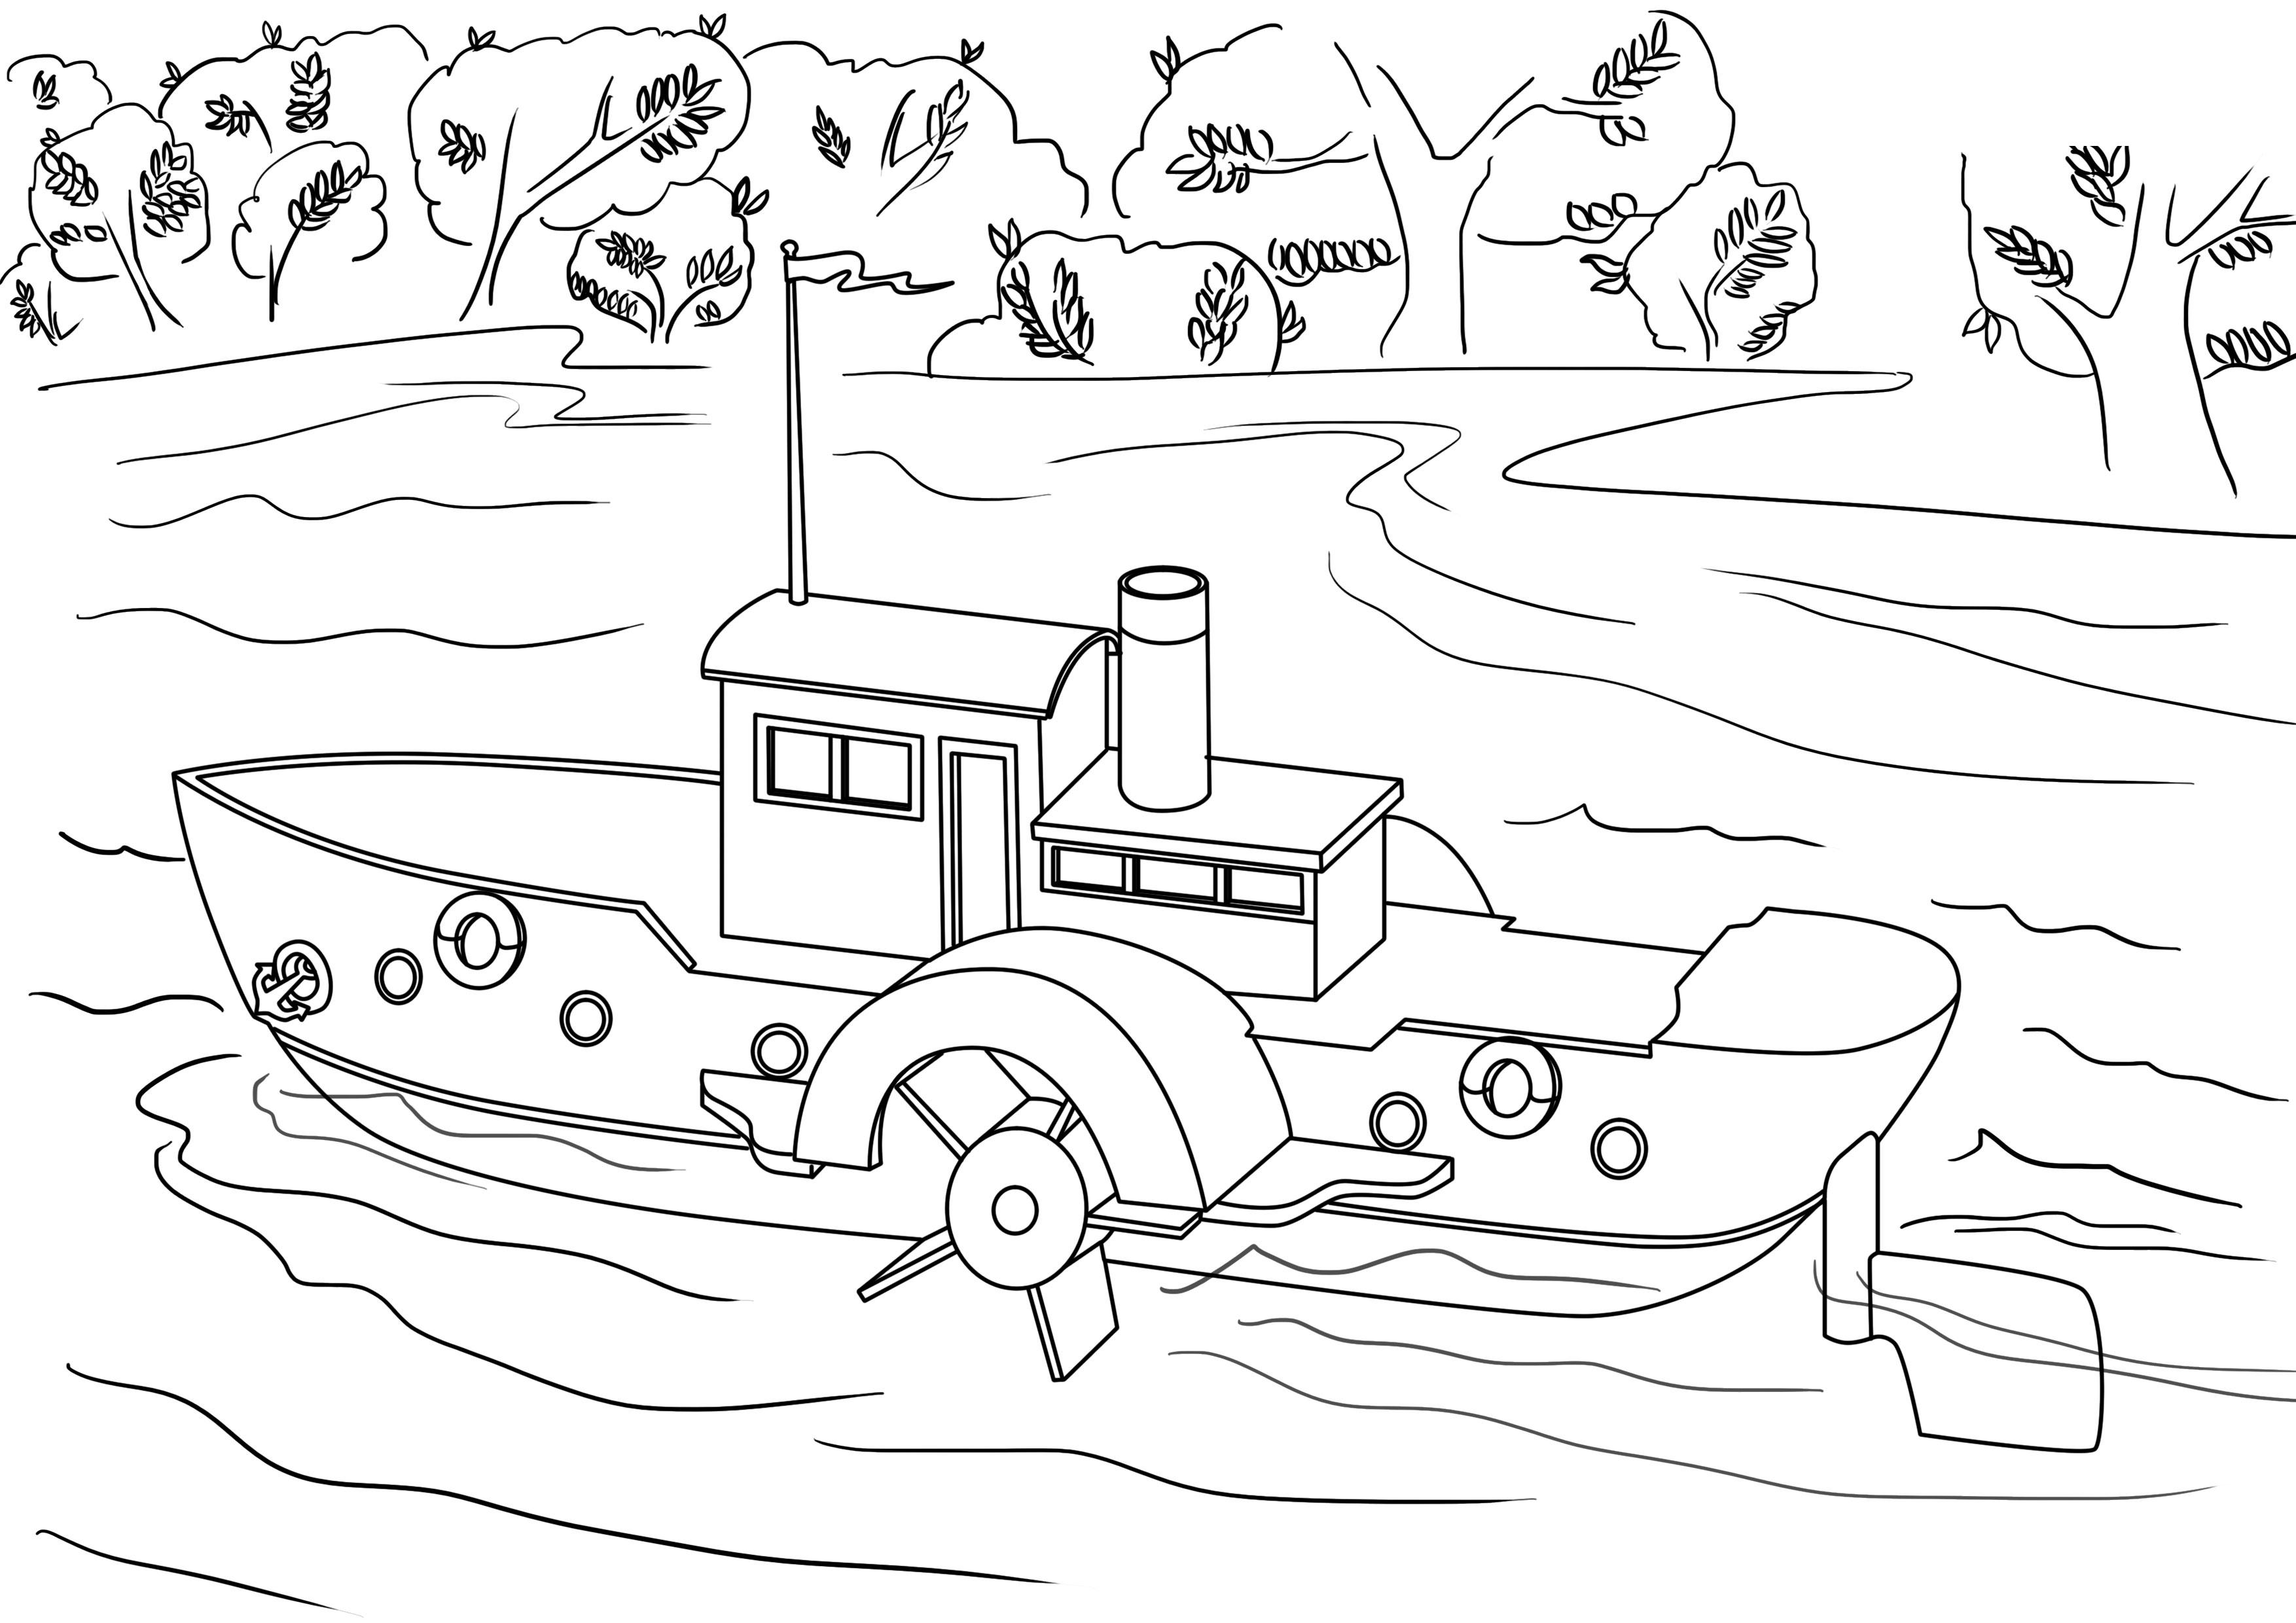 Древний фрегат фрегат паруса корабли Раскраски для мальчиков